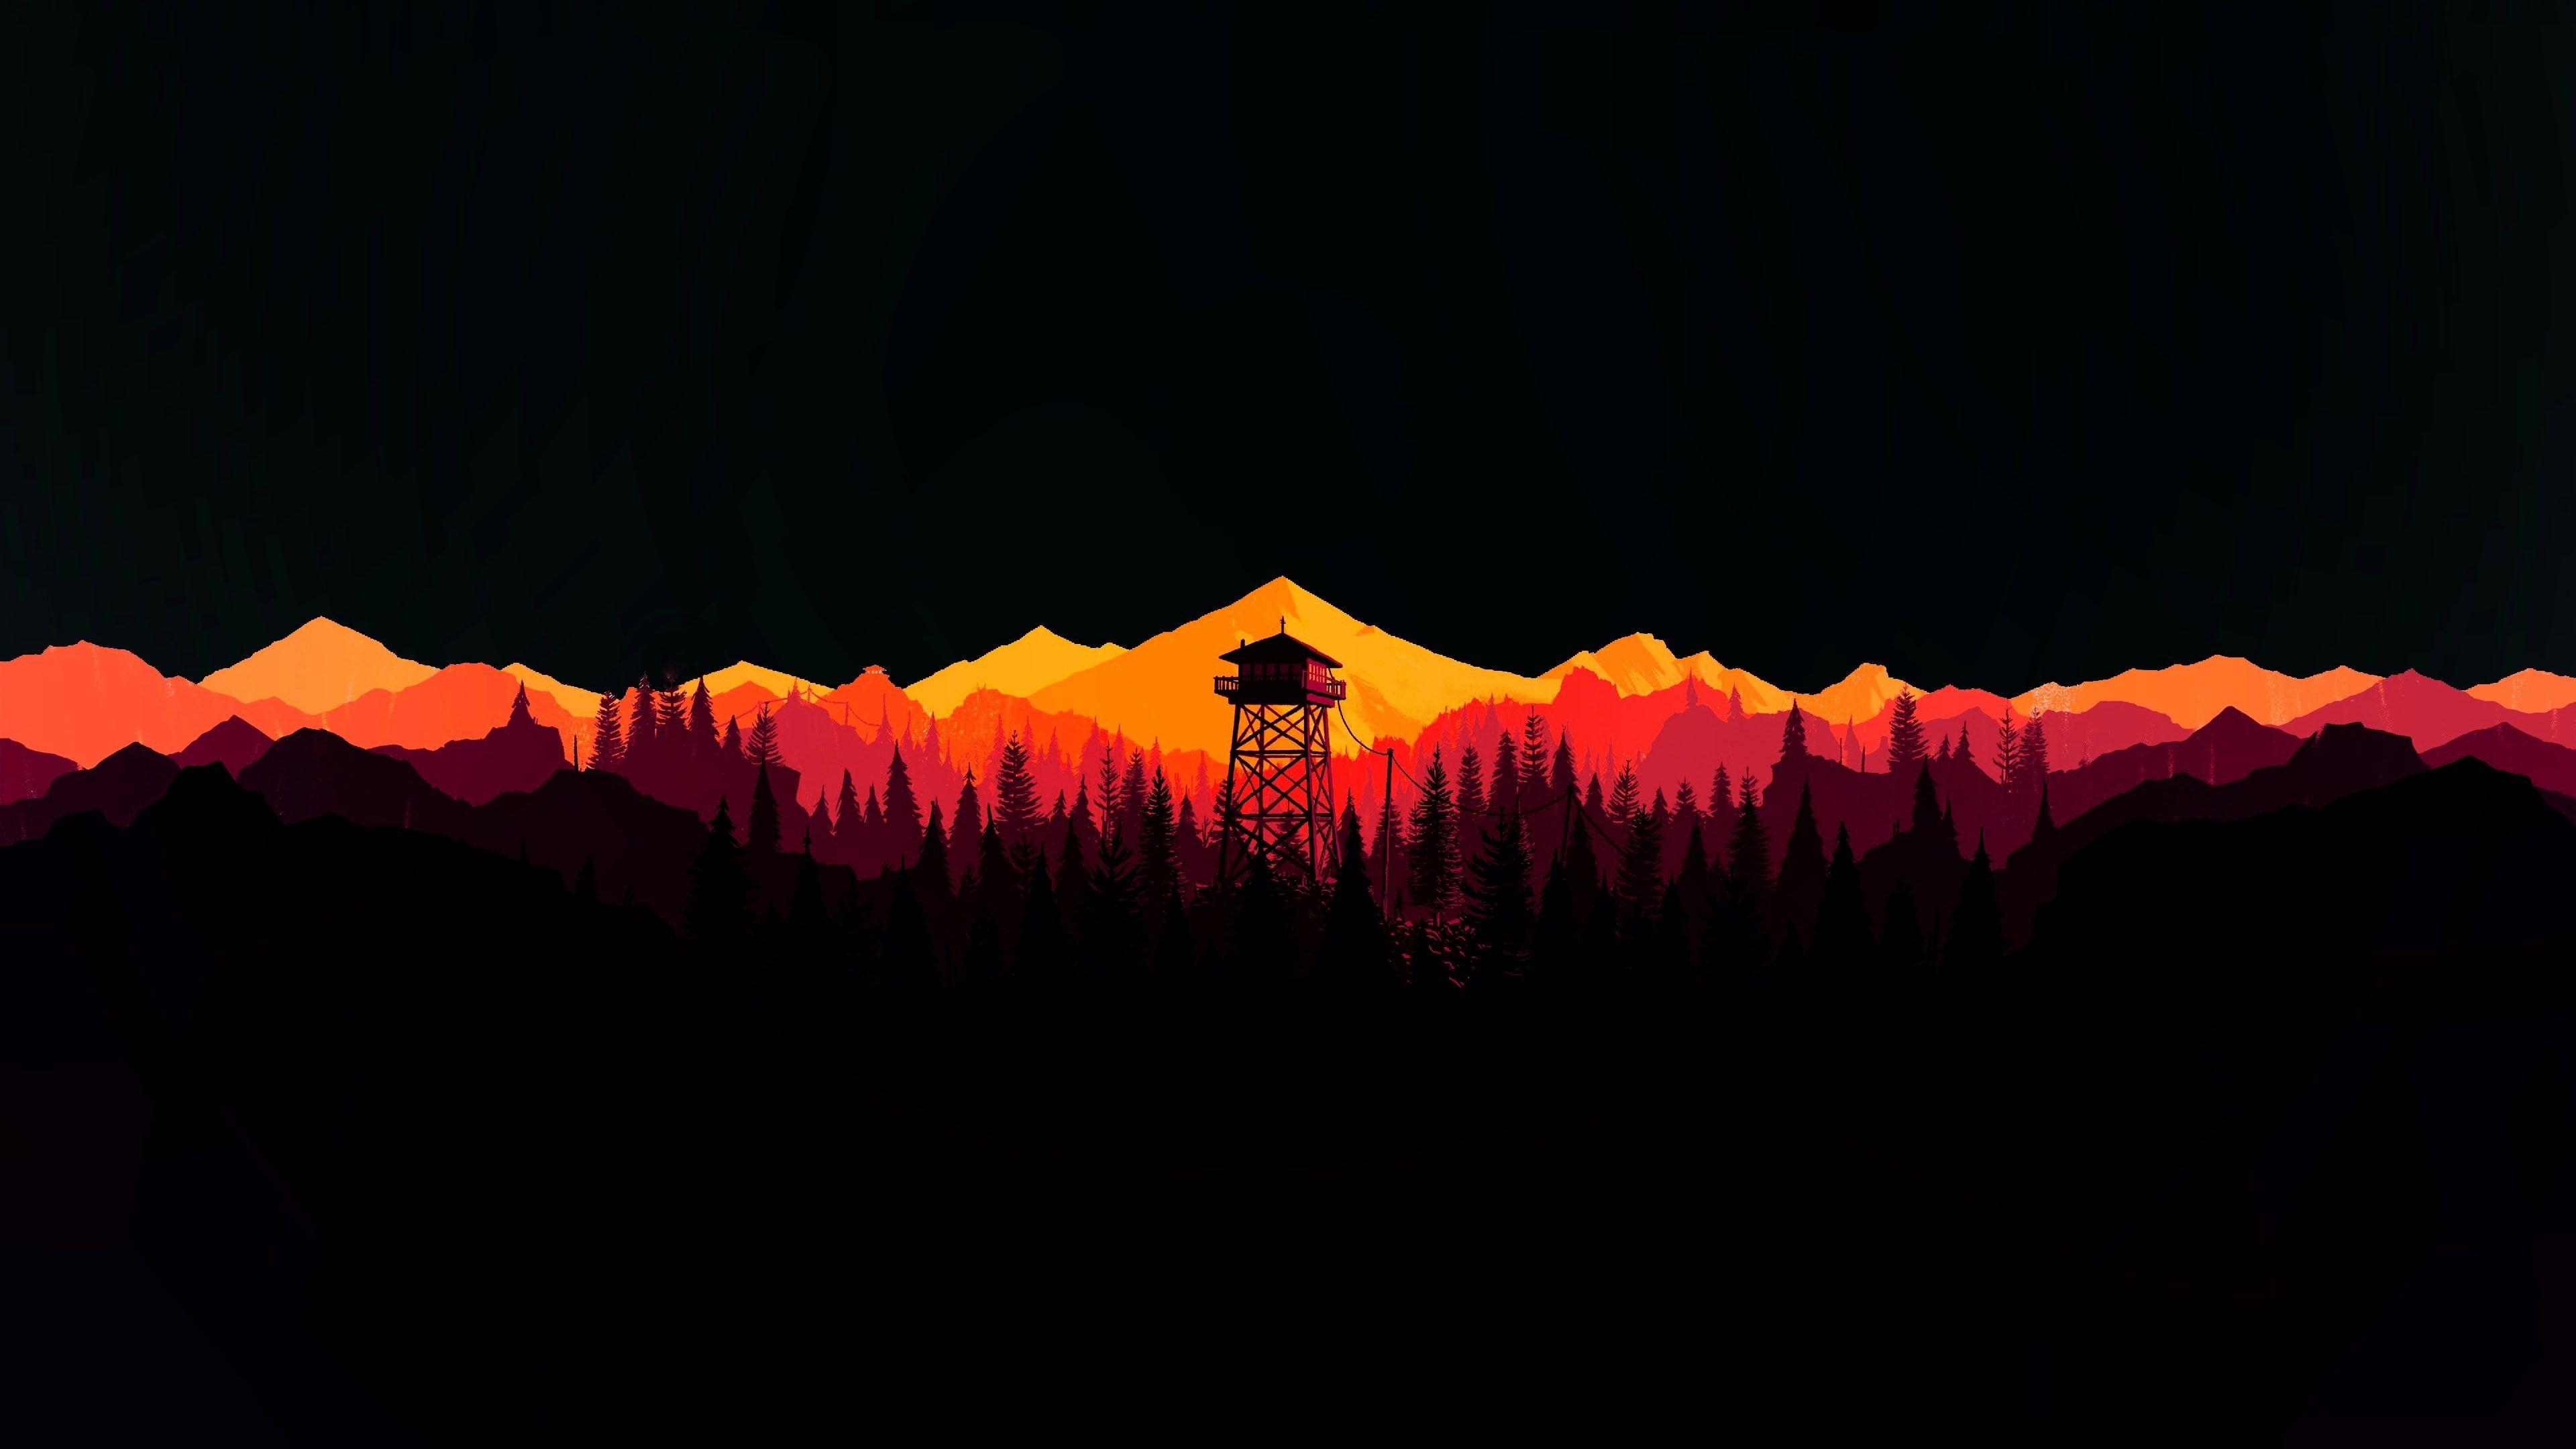 Cool Wallpapers For Desktop 4k